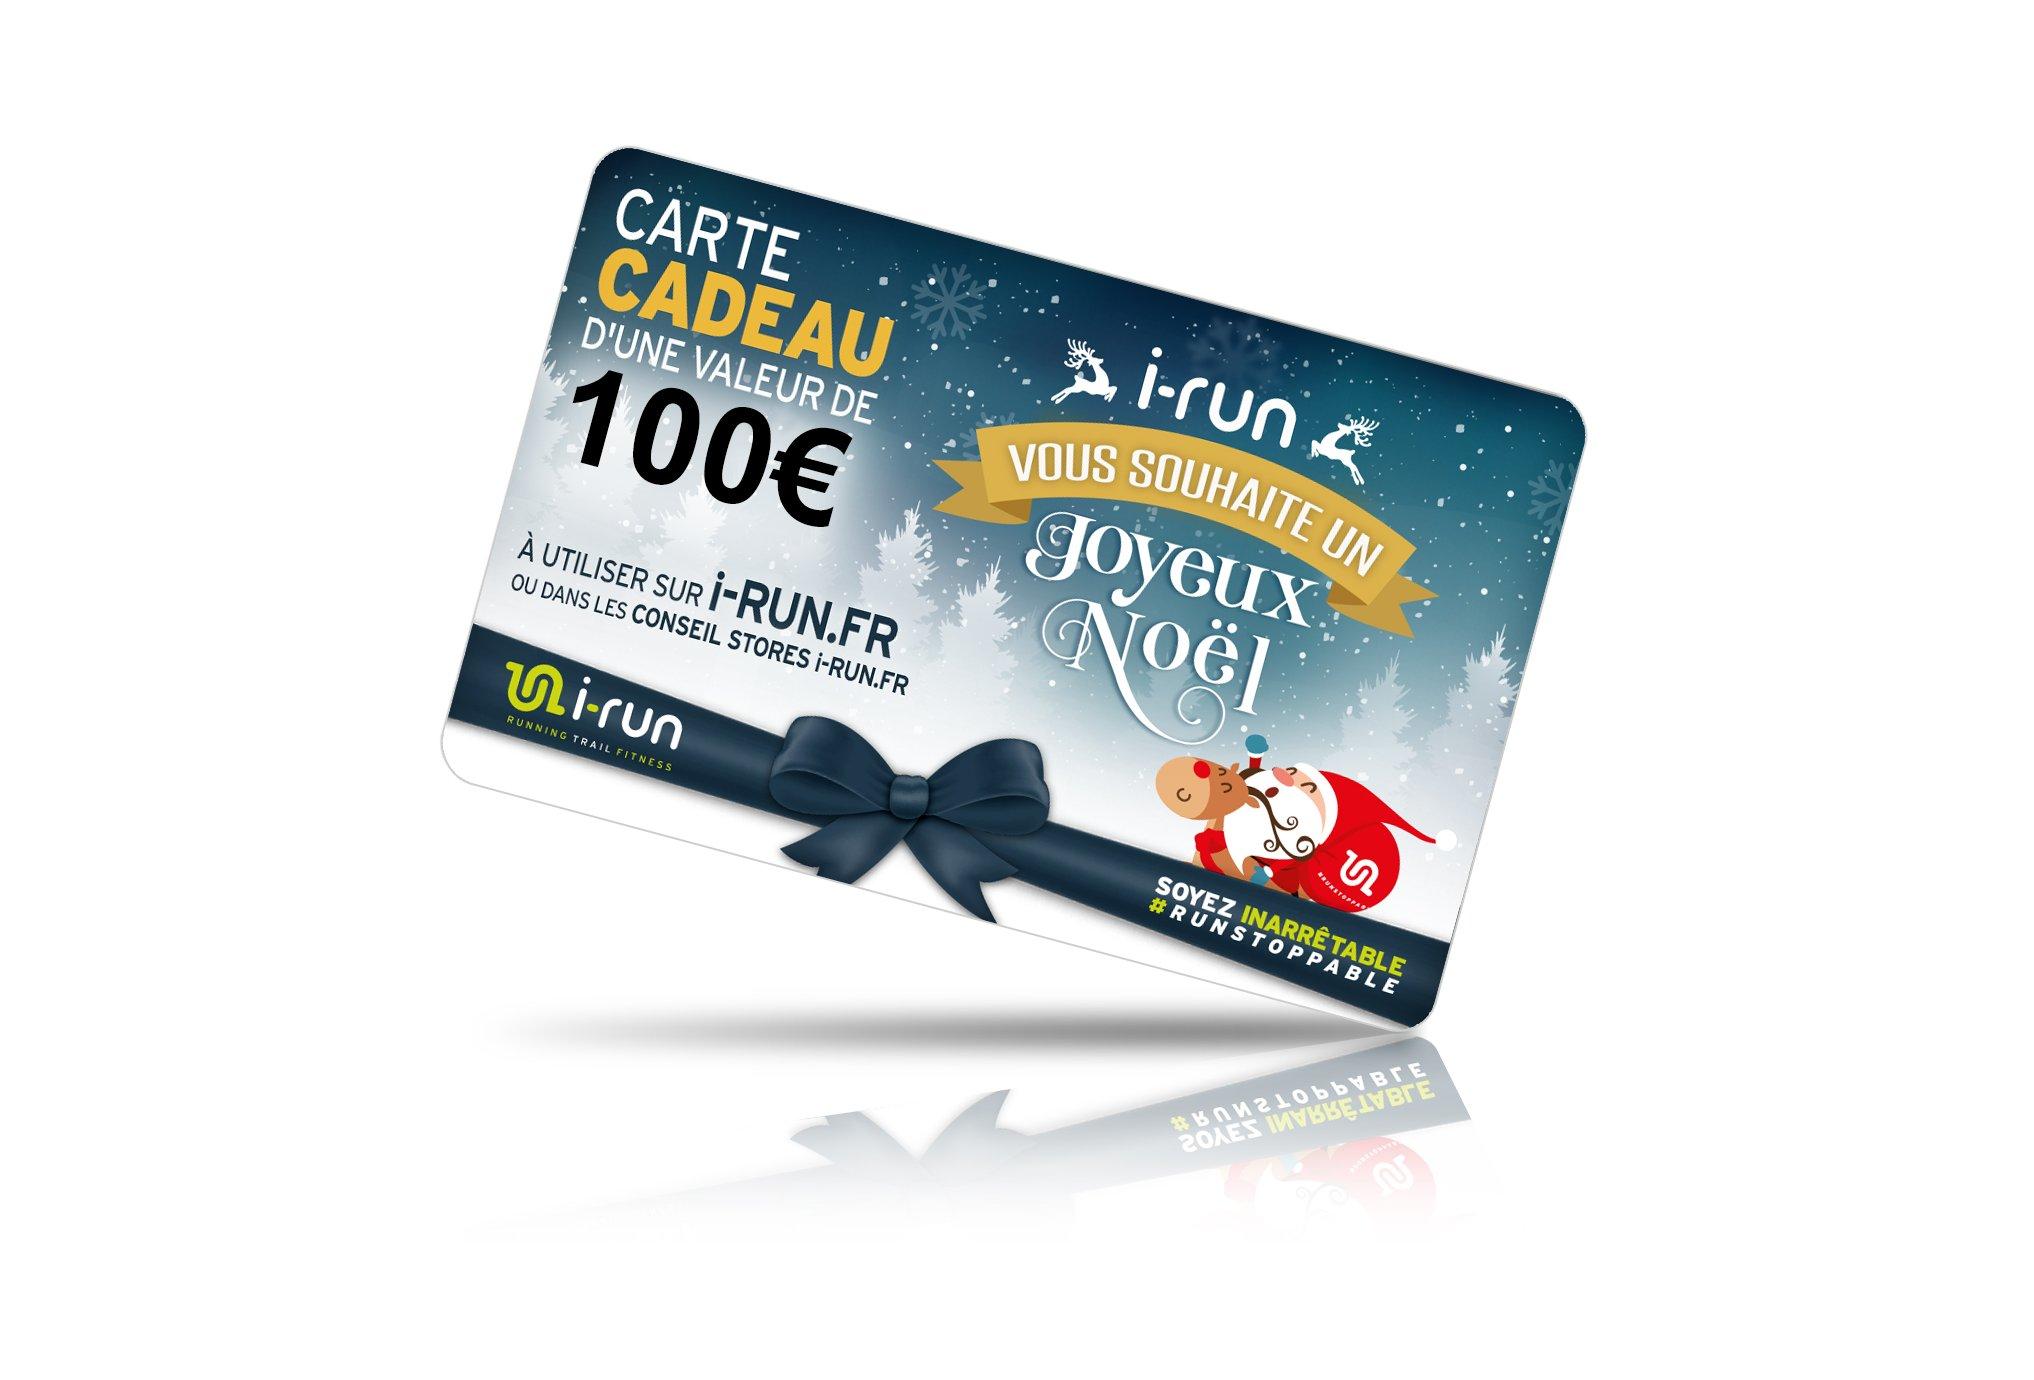 i-run.fr Carte Cadeau 100 Spéciale Noël Cartes Cadeau